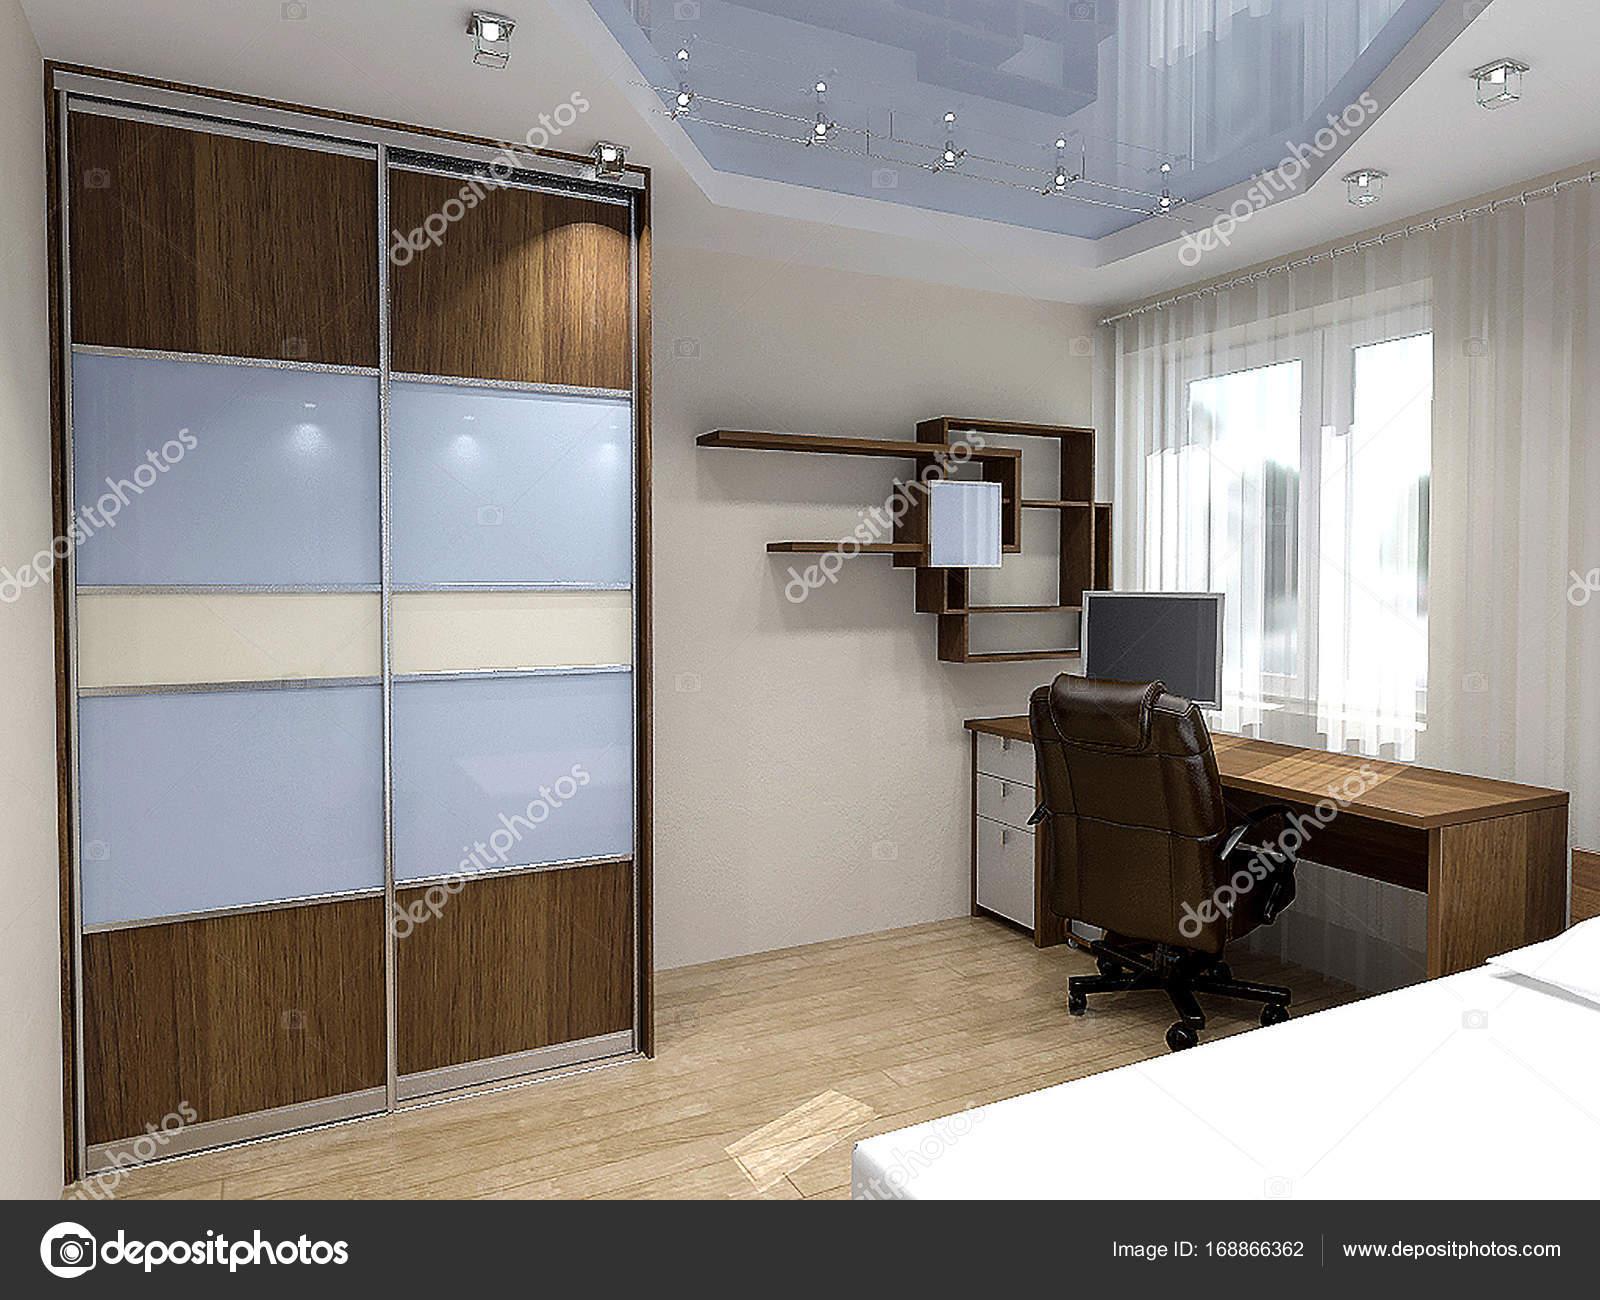 Slaapkamer hedendaagse styling, 3d illustratie — Stockfoto ...